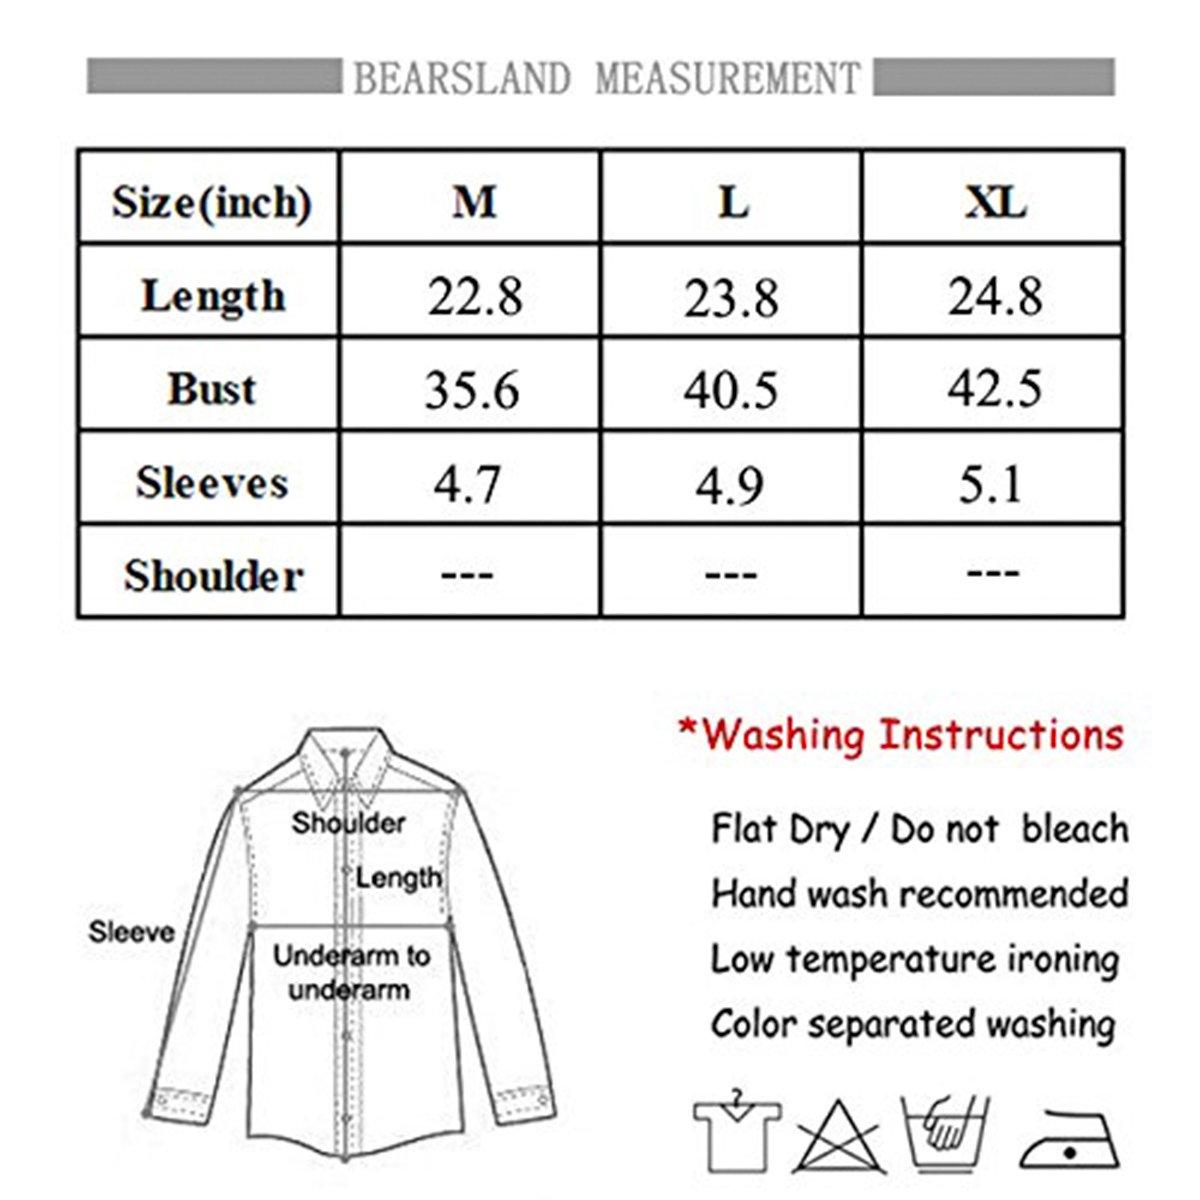 Bearsland Womens Maternity Short Sleeves Nursing Tops Breastfeeding Shirts